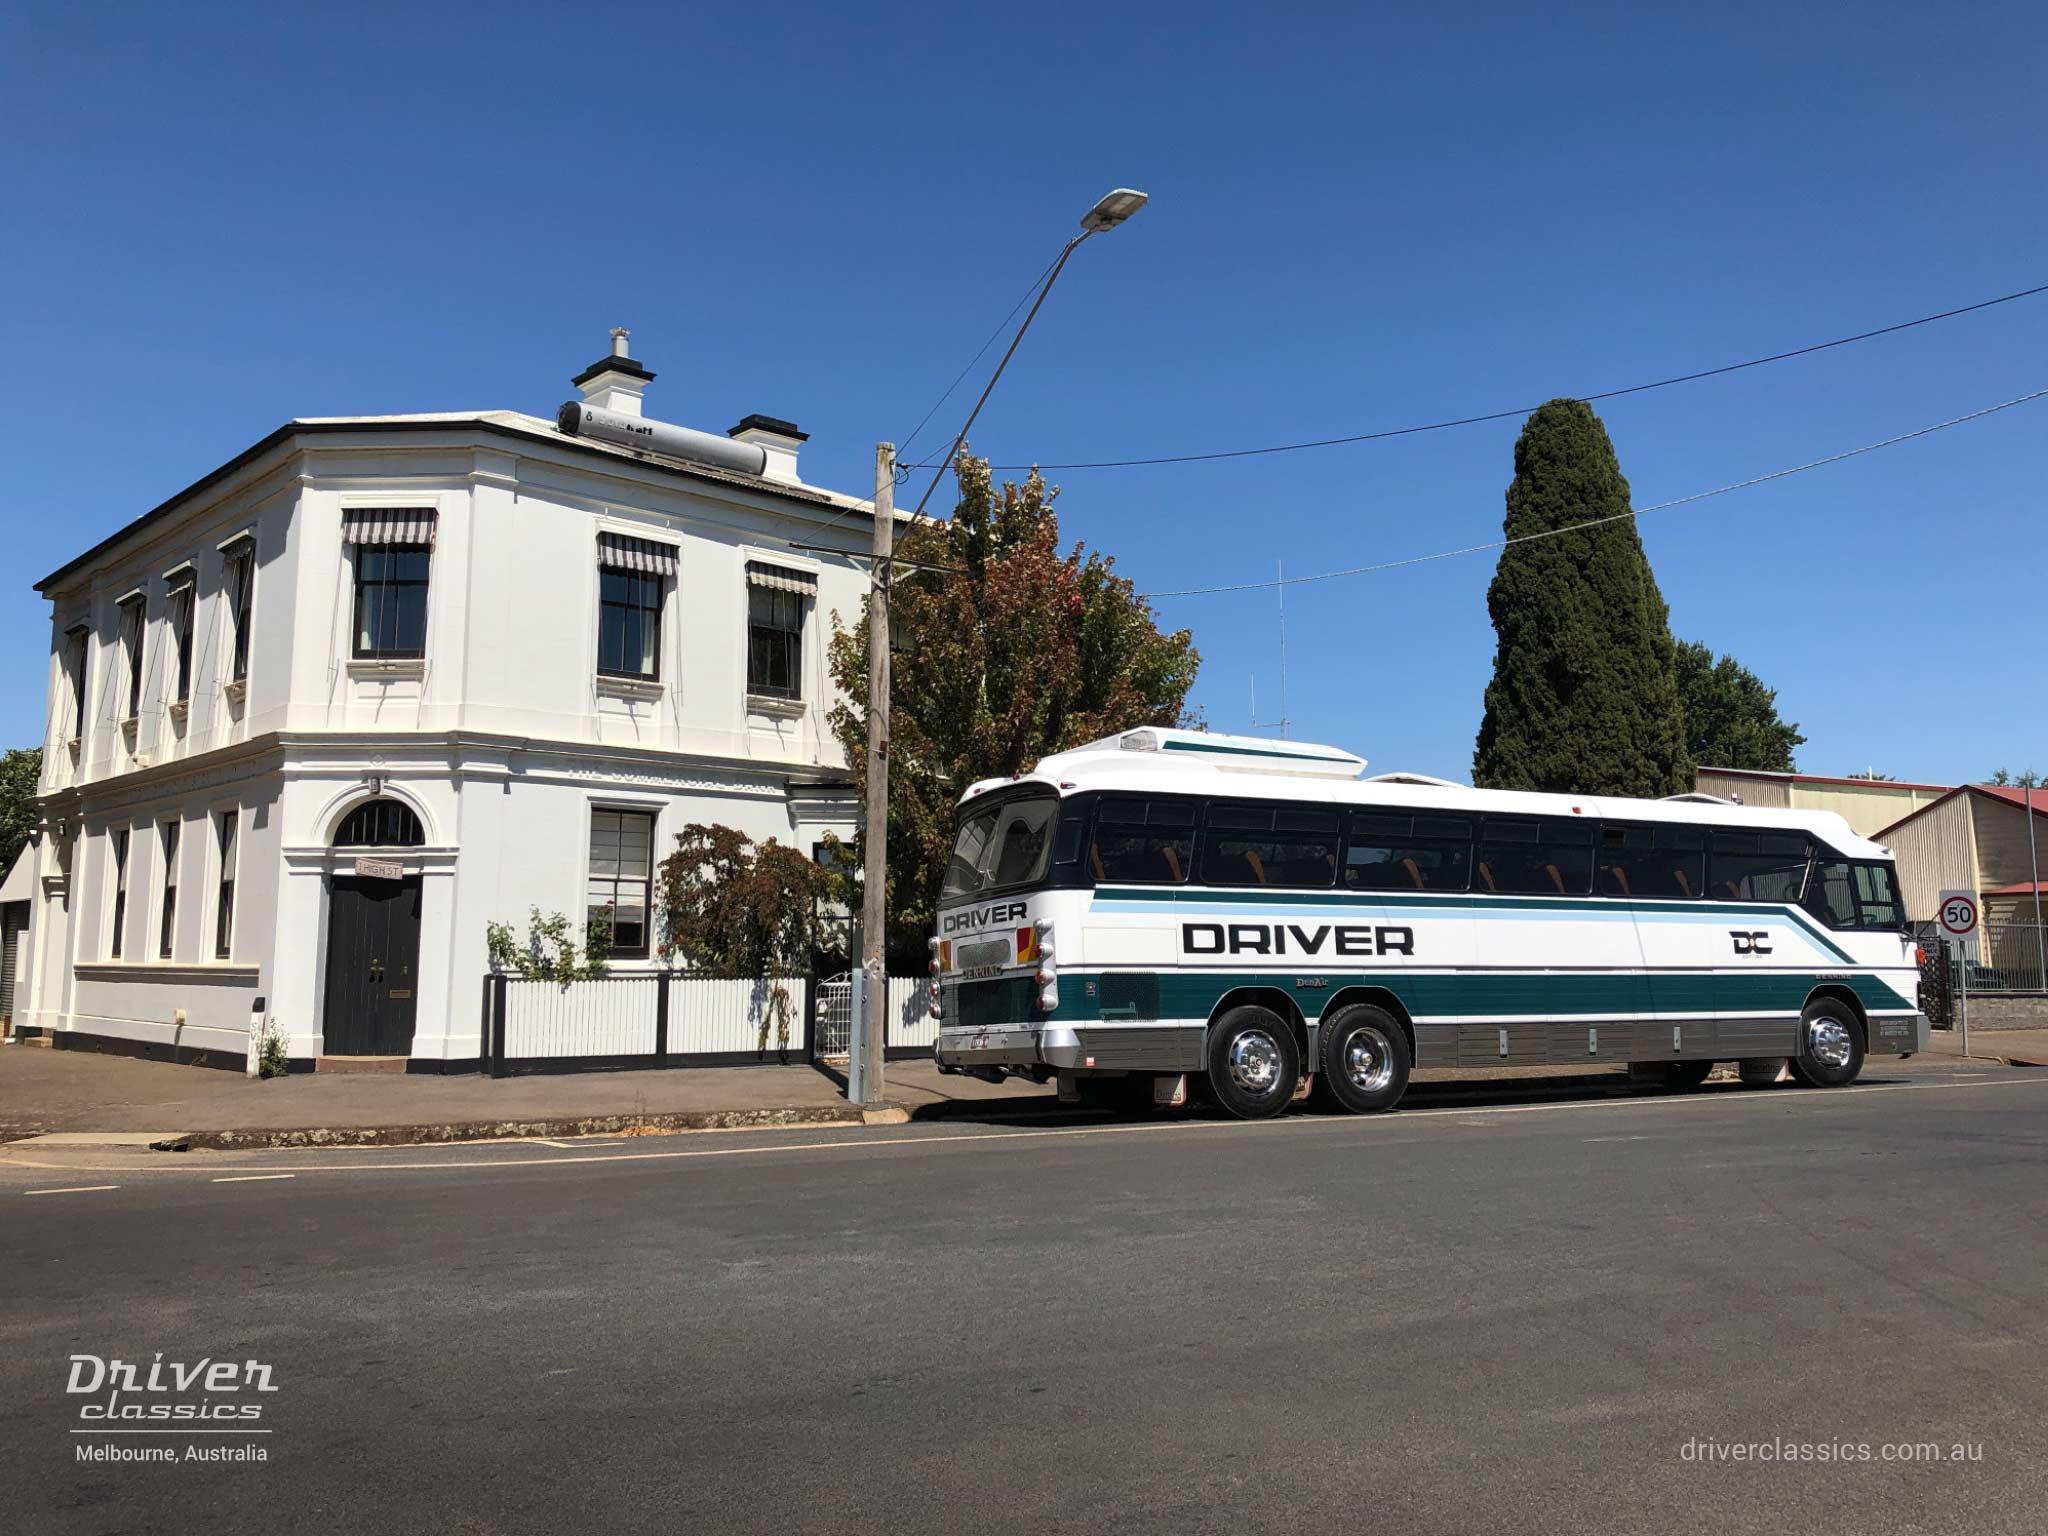 GM Denning DenAir Mono Bus, 1983 version, side and back, Photo taken February 2019